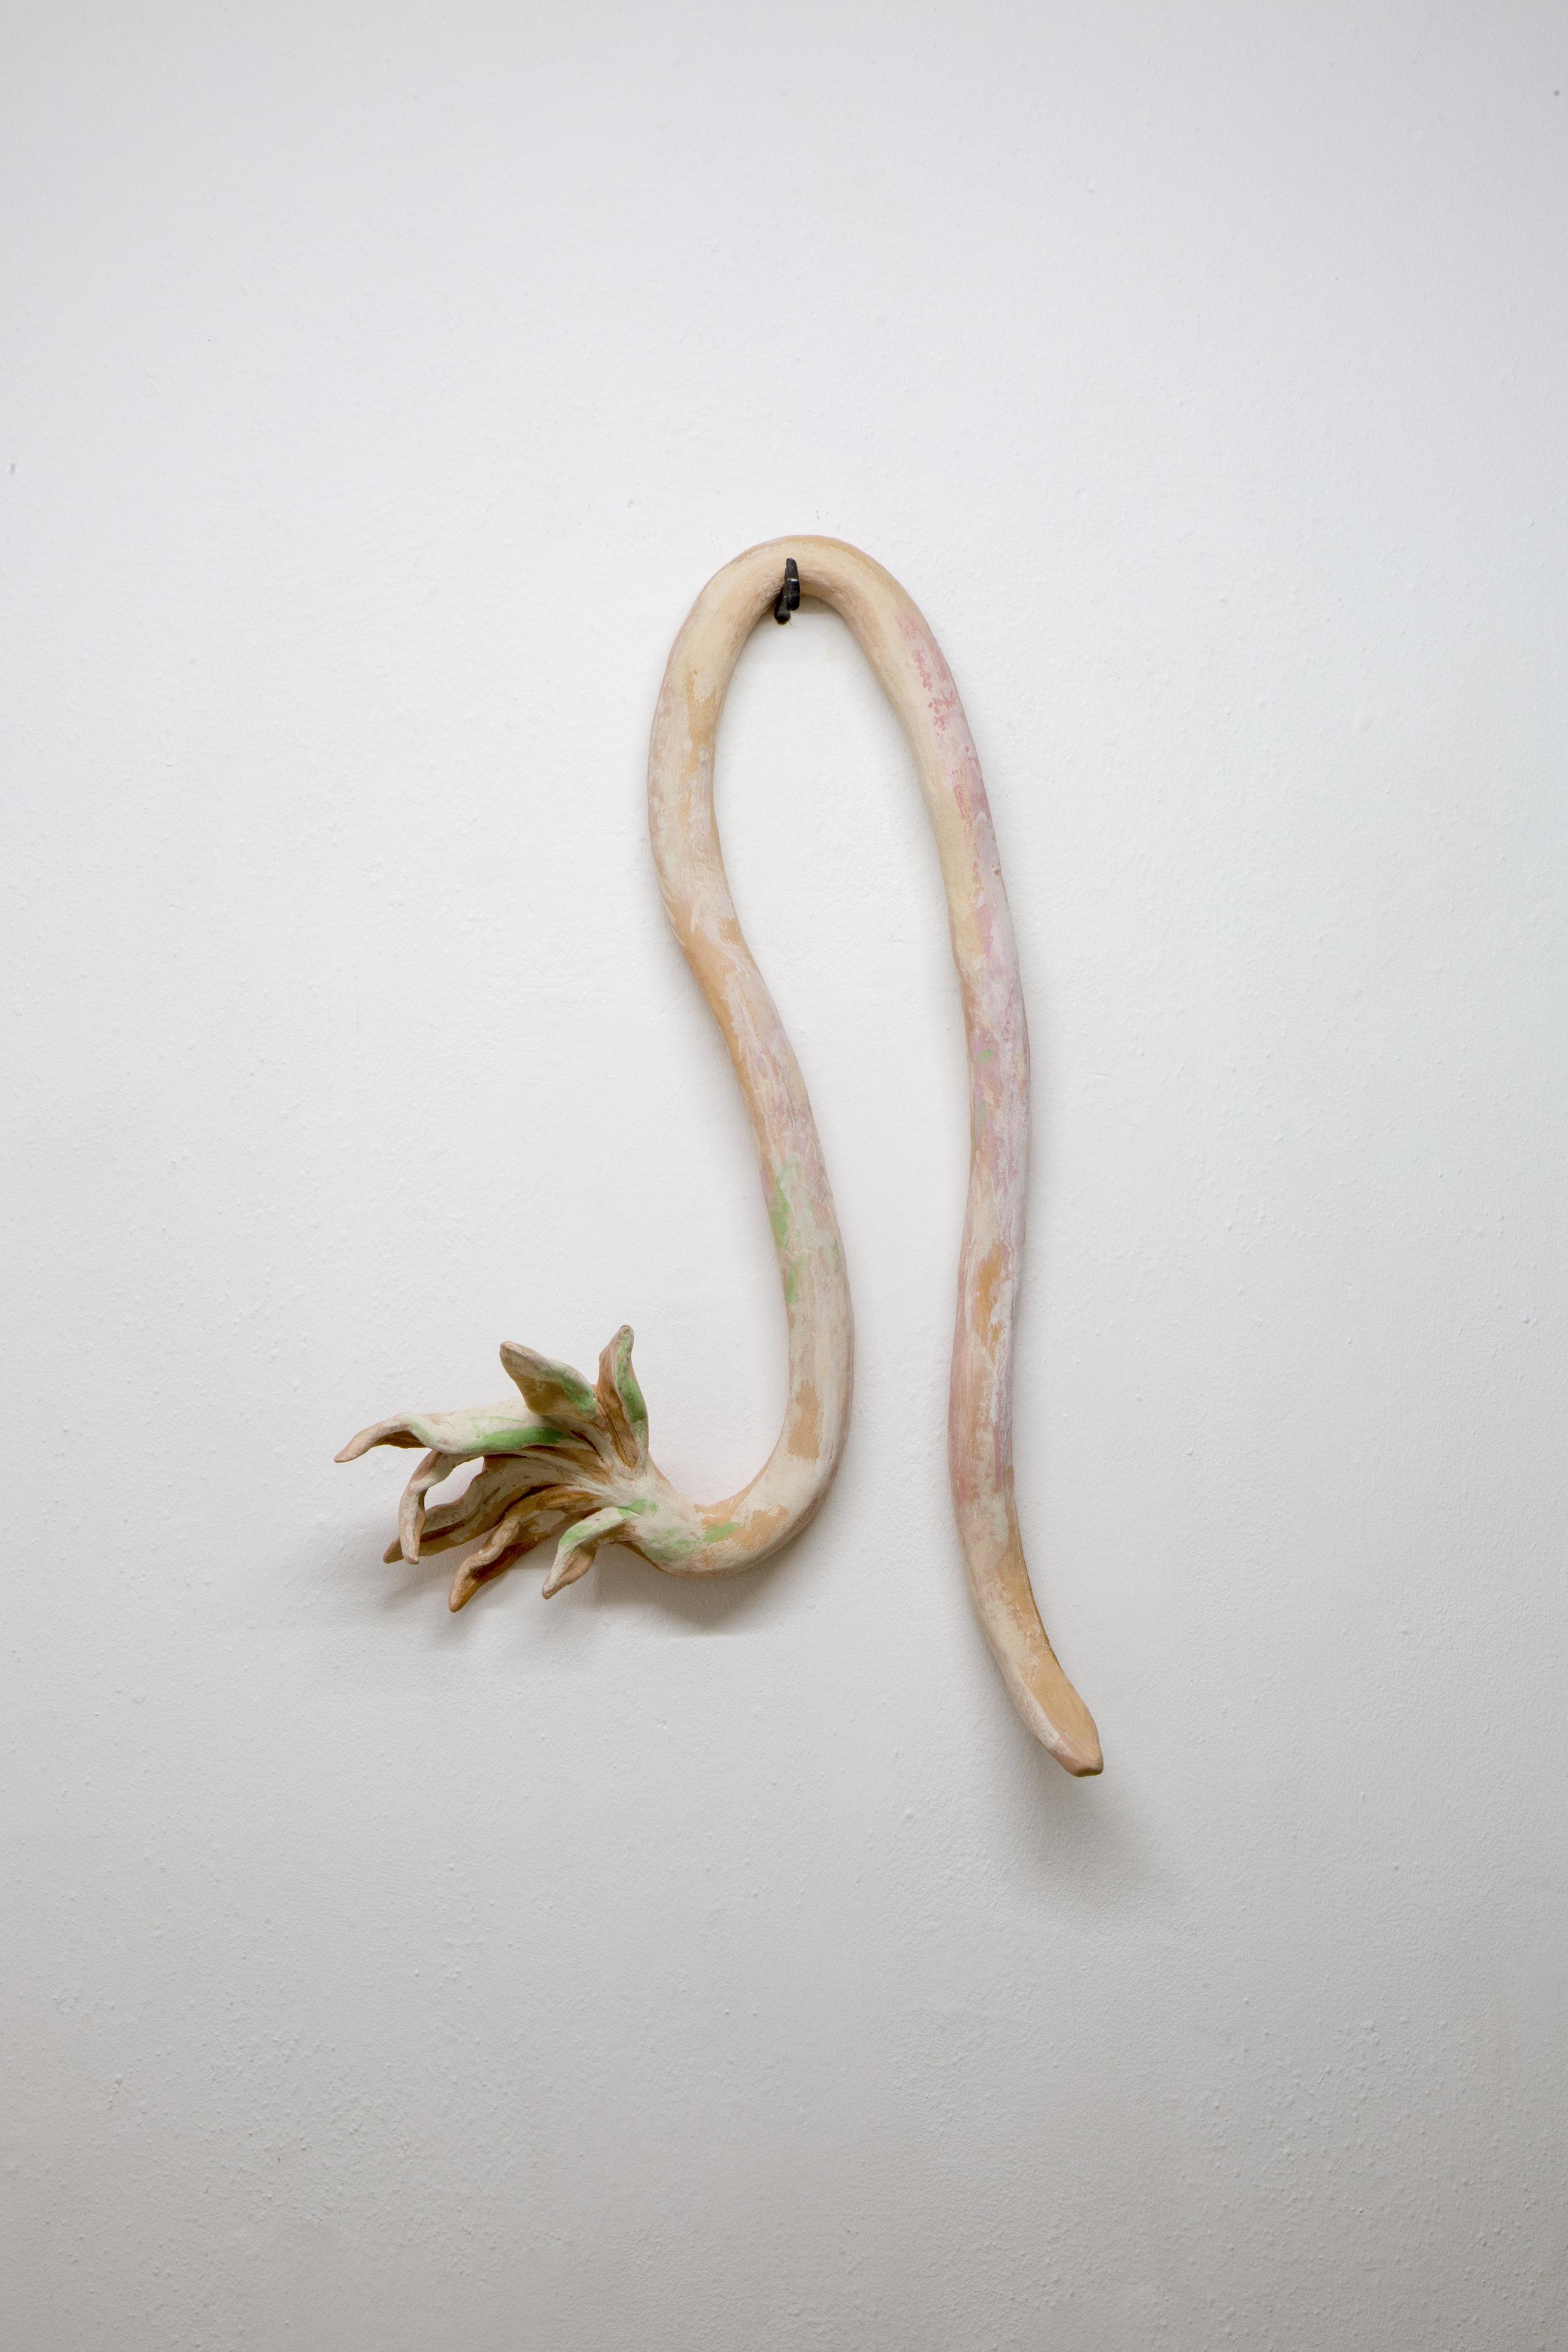 Lorena Ancona, Orquidea y Serpiente, 2018.  Low temperature ceramic, latex, pigments, lime.